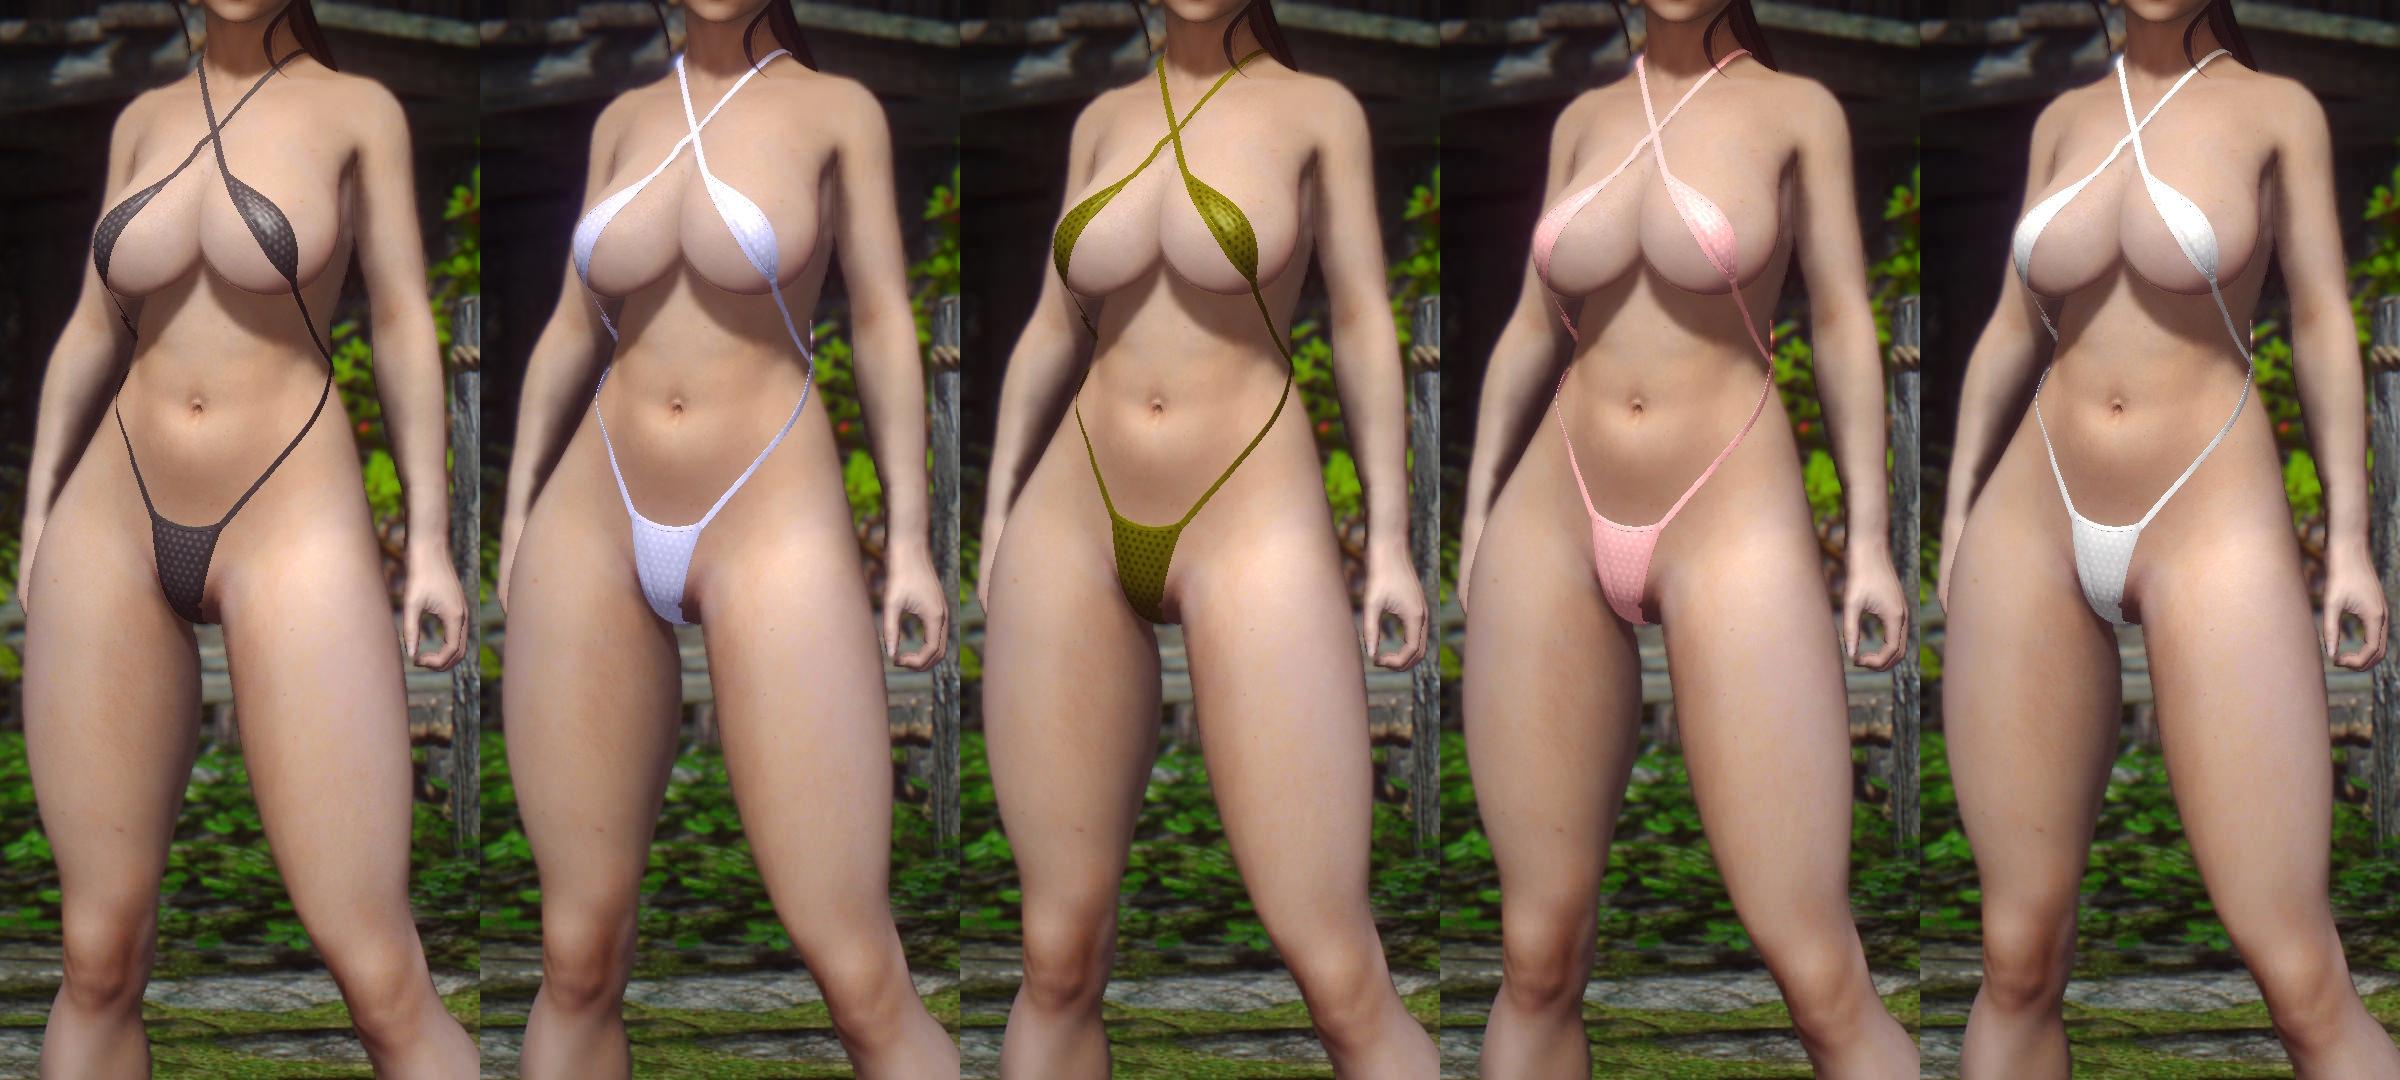 Daz_Bikini_Collection_2_7BO_16.jpg